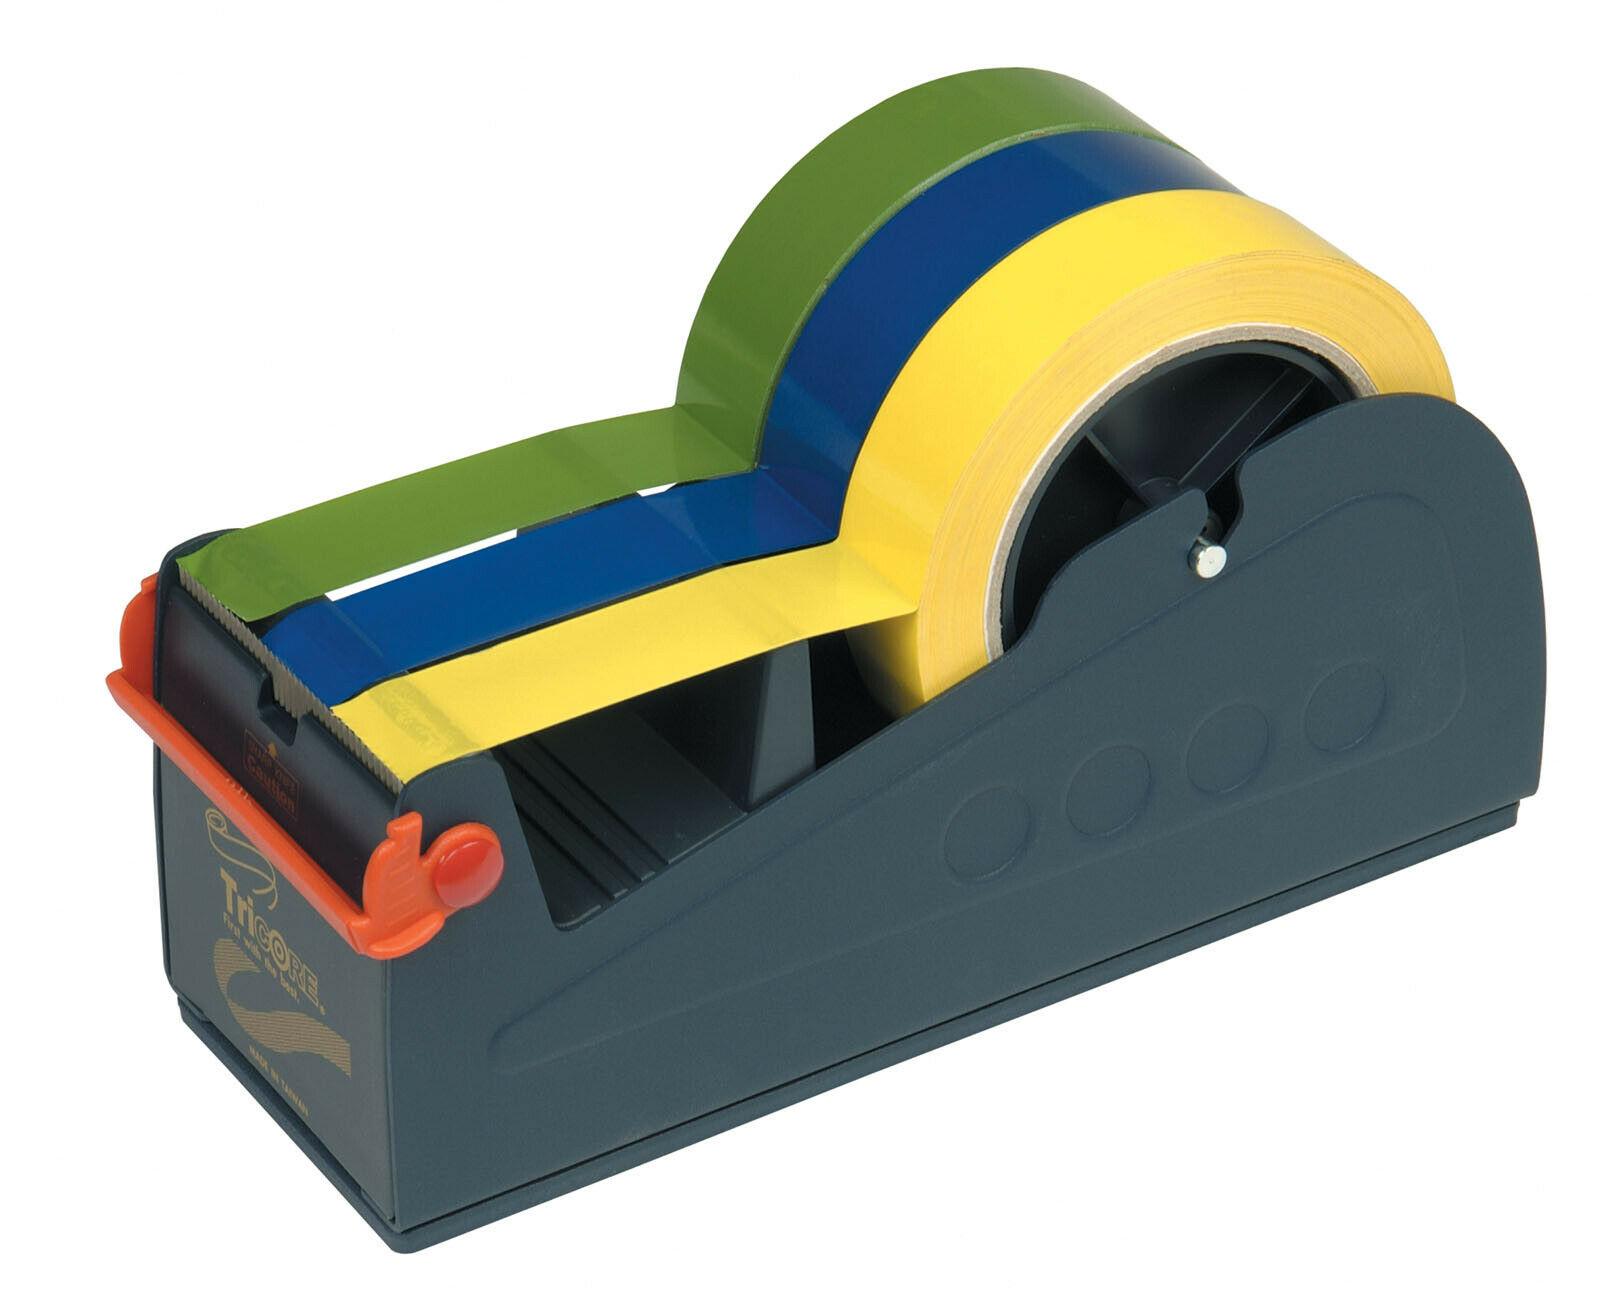 PD351 Multi Roll Bench Tape Dispenser for Three 25mm or One 75mm Adhesive Tapes 163719598358 - PD351 Multi Roll Bench Tape Dispenser for Three 25mm or One 75mm Adhesive Tapes